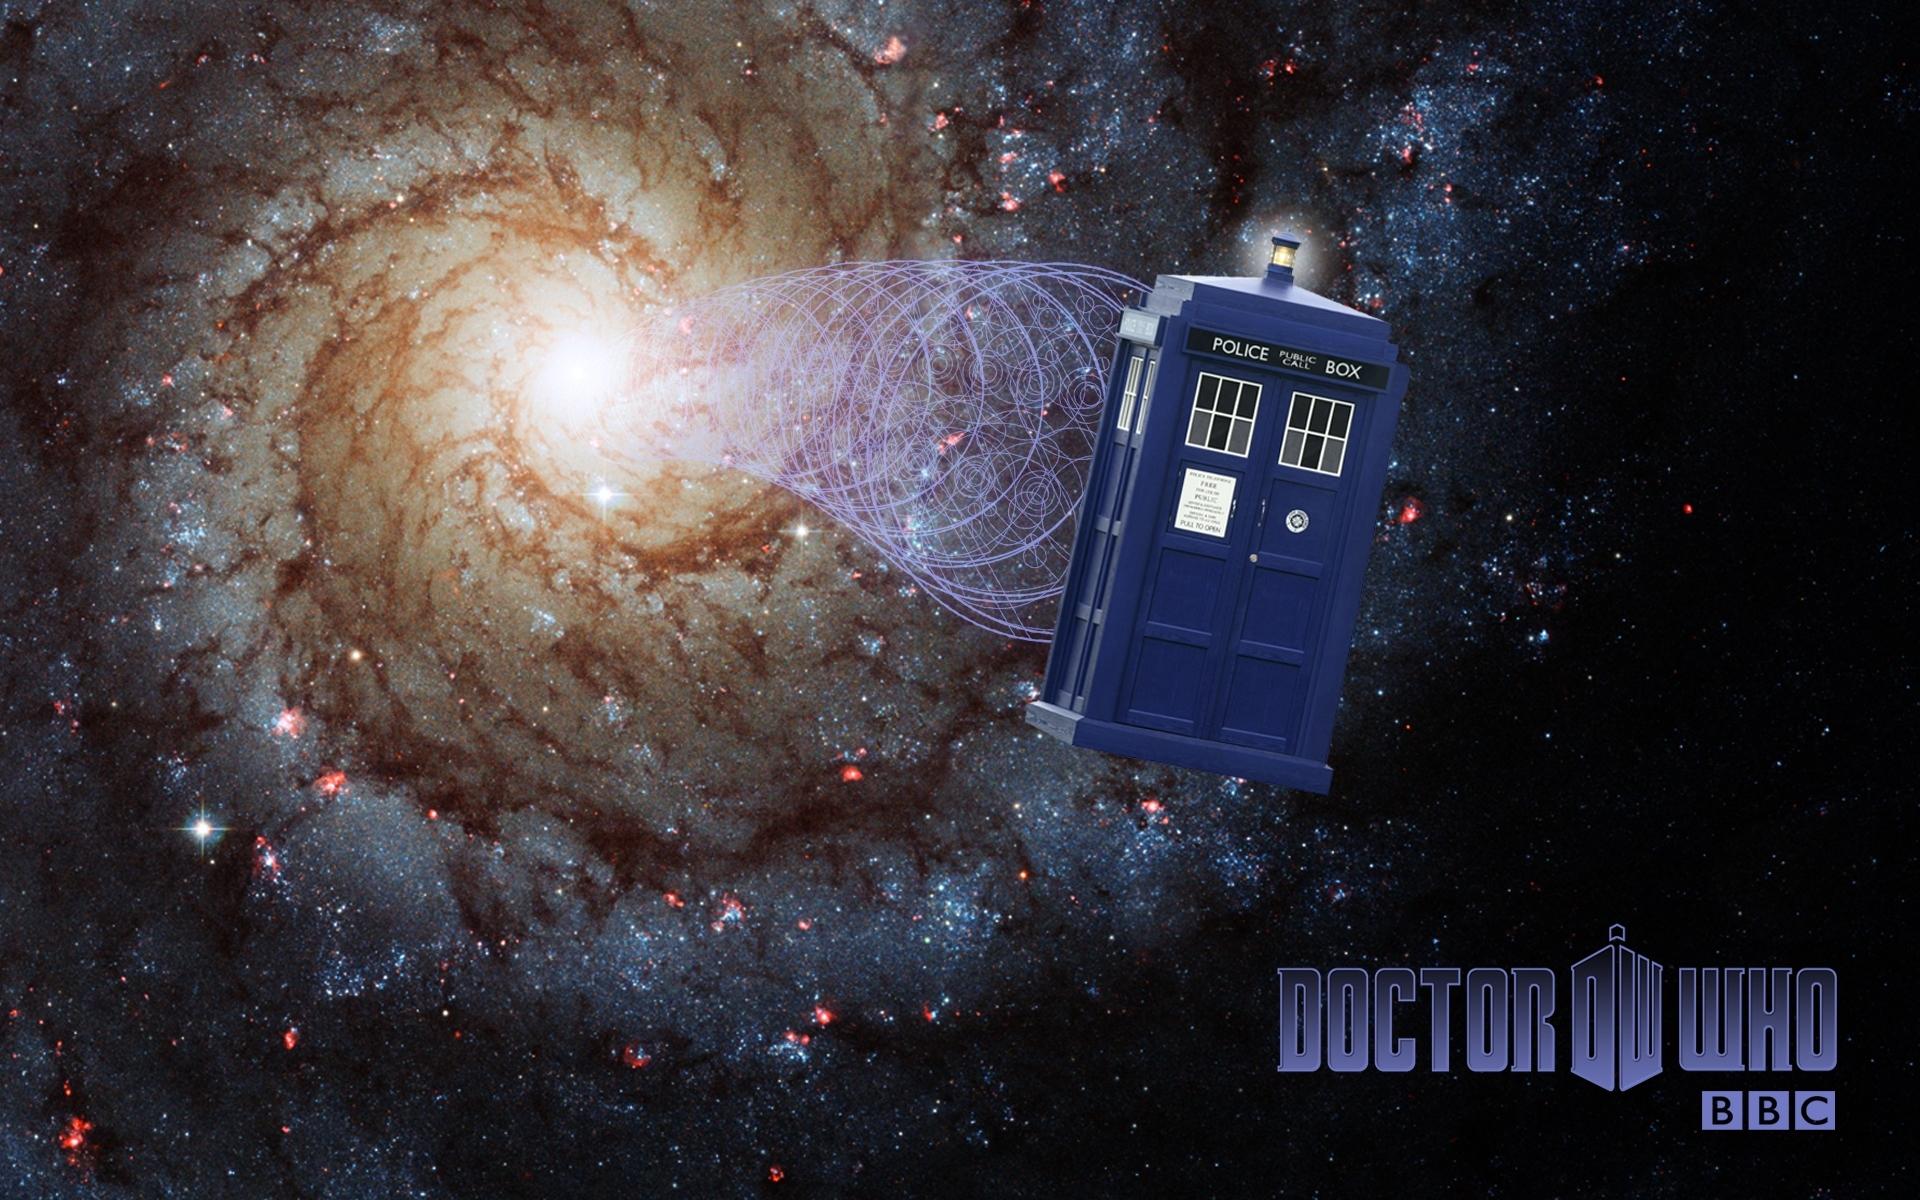 doctor who wallpapers tardis #6973875